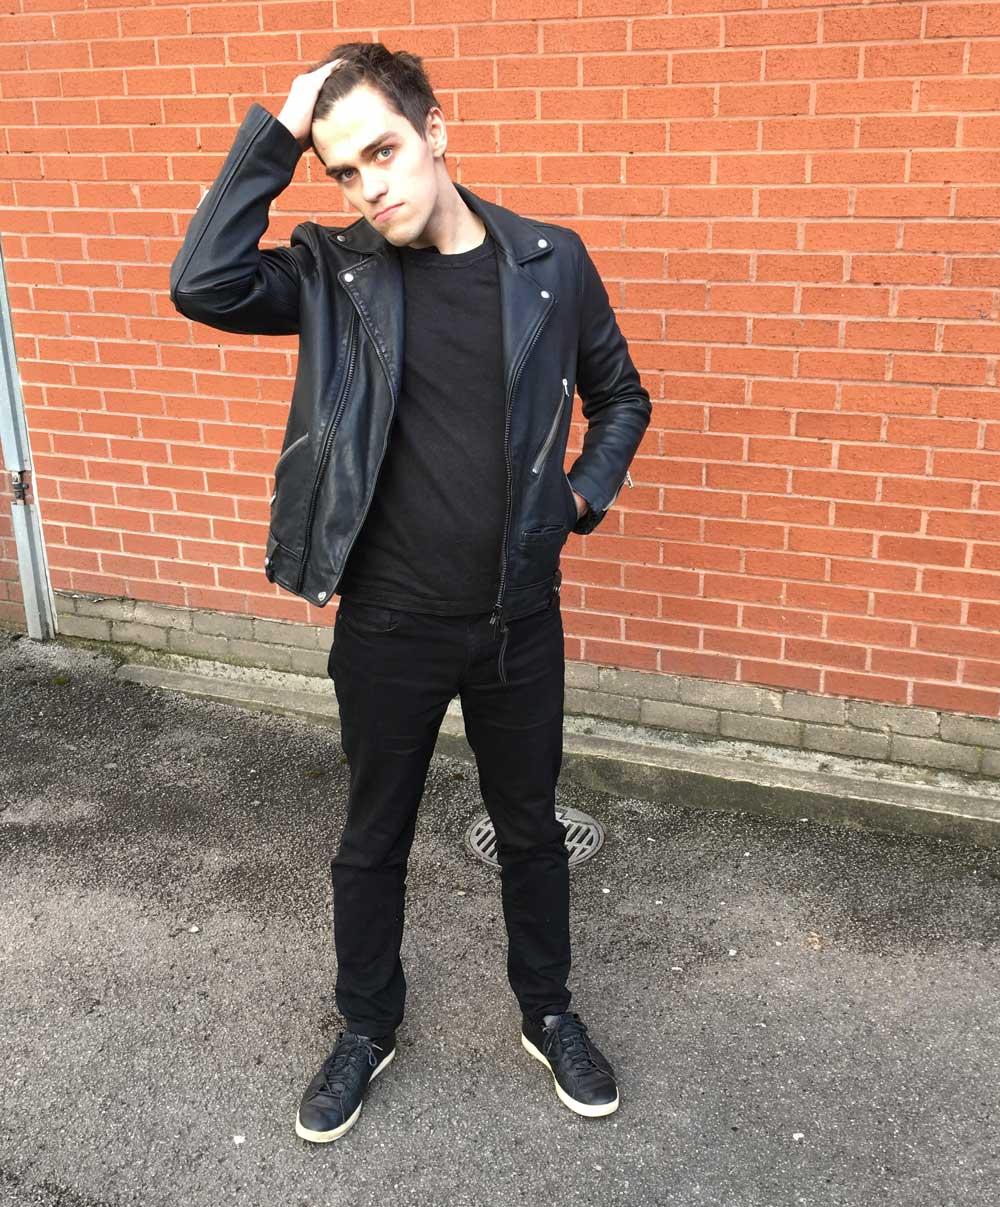 Zac Silk wearing a black outfit